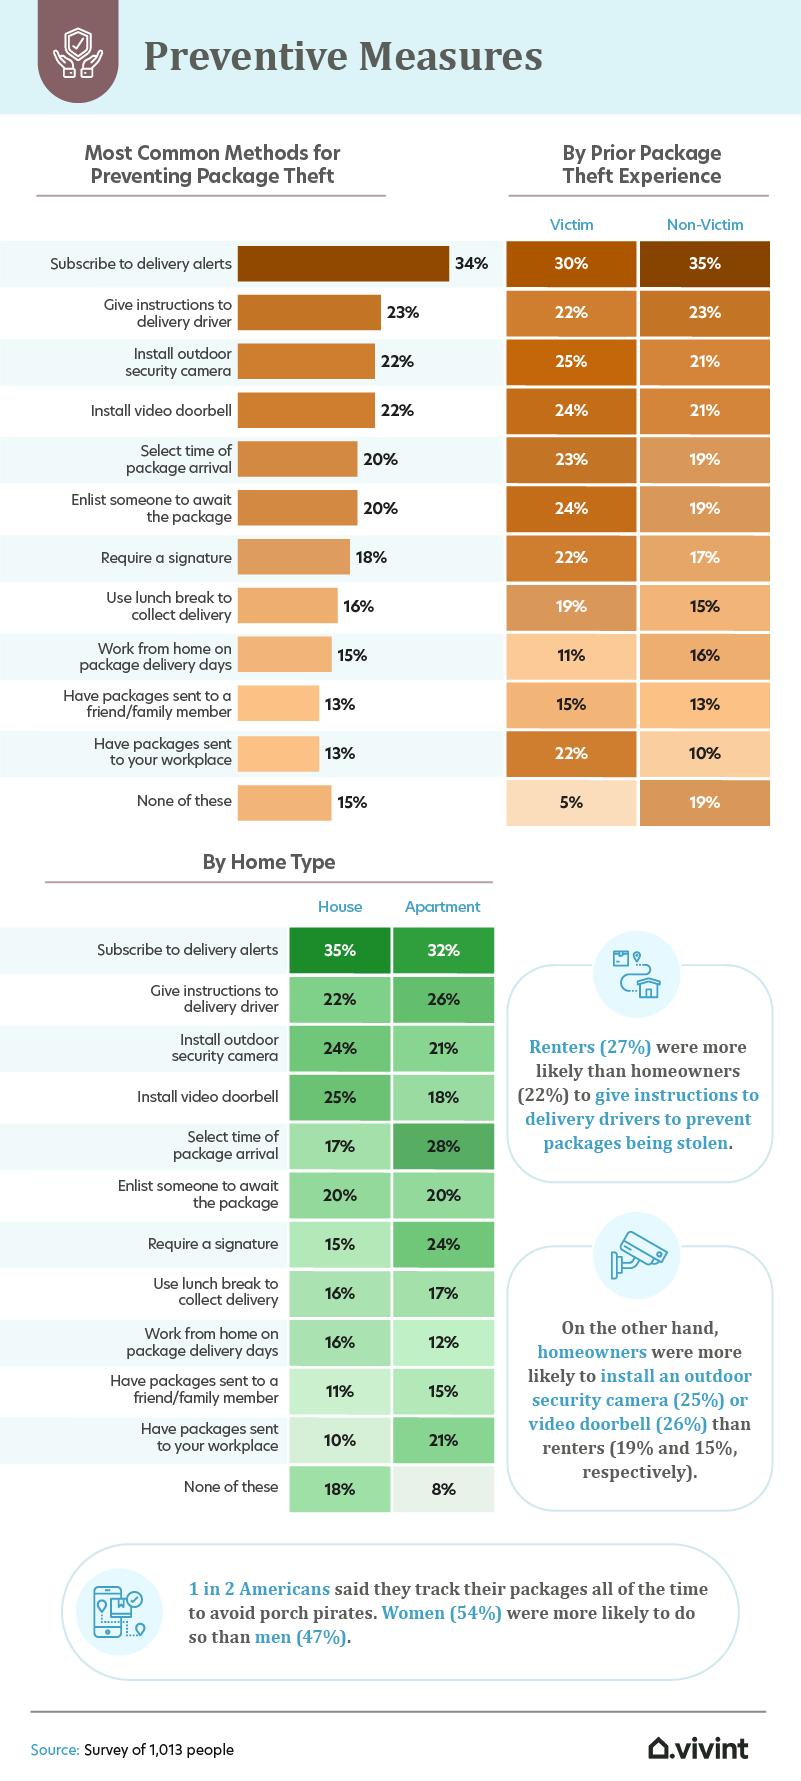 preventive measures infographic